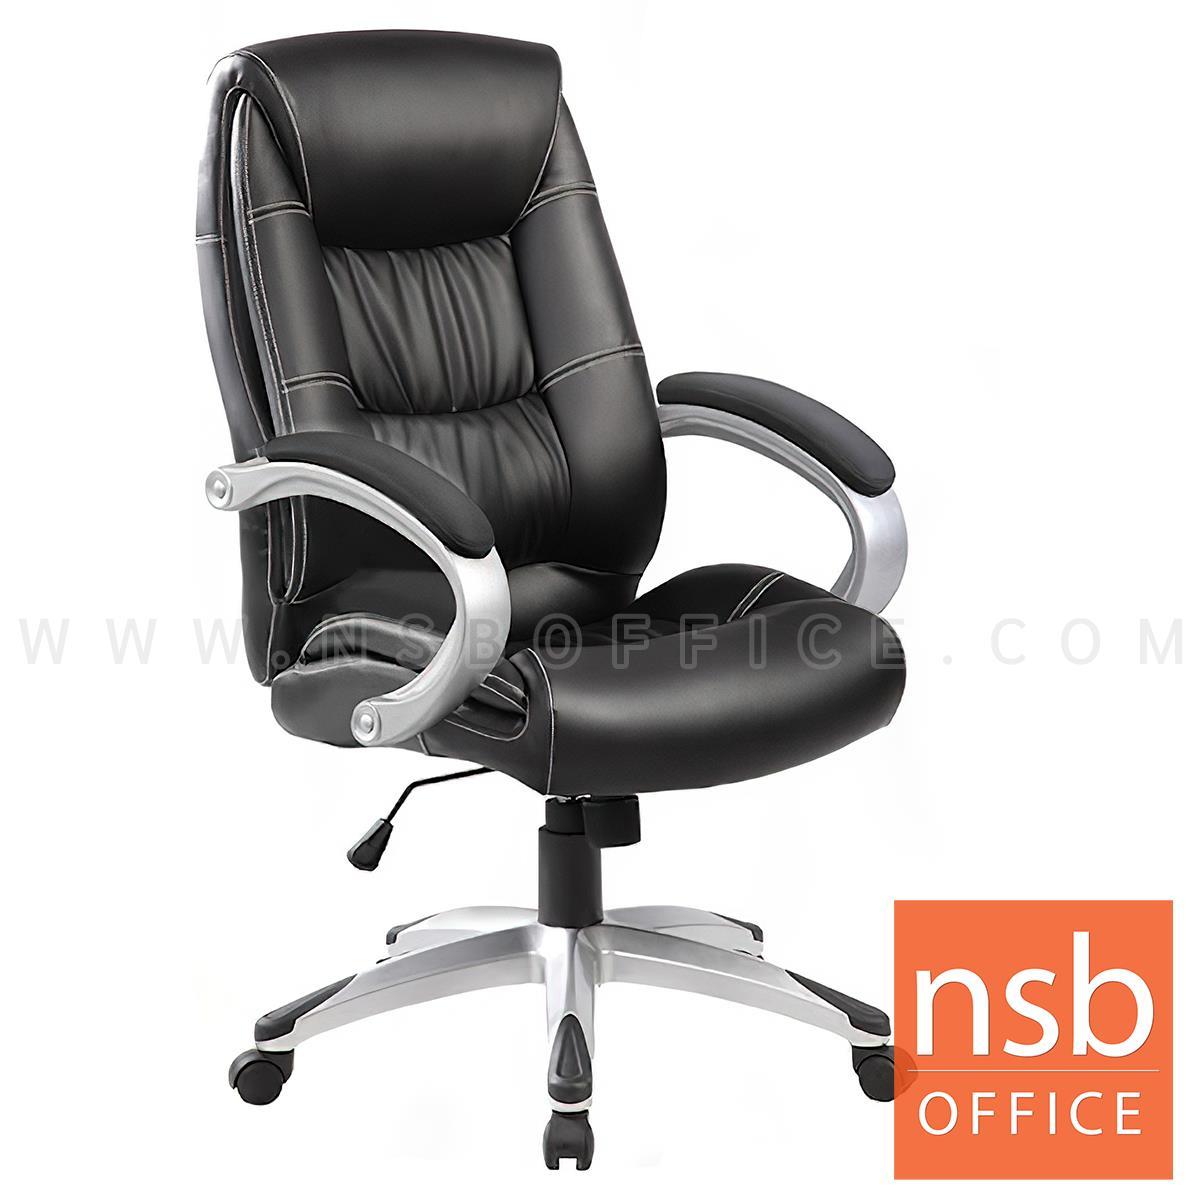 B01A527:เก้าอี้ผู้บริหาร รุ่น Scoville (สกอวิลล์)  โช๊คแก๊ส ก้อนโยก ขาอลูมิเนียม